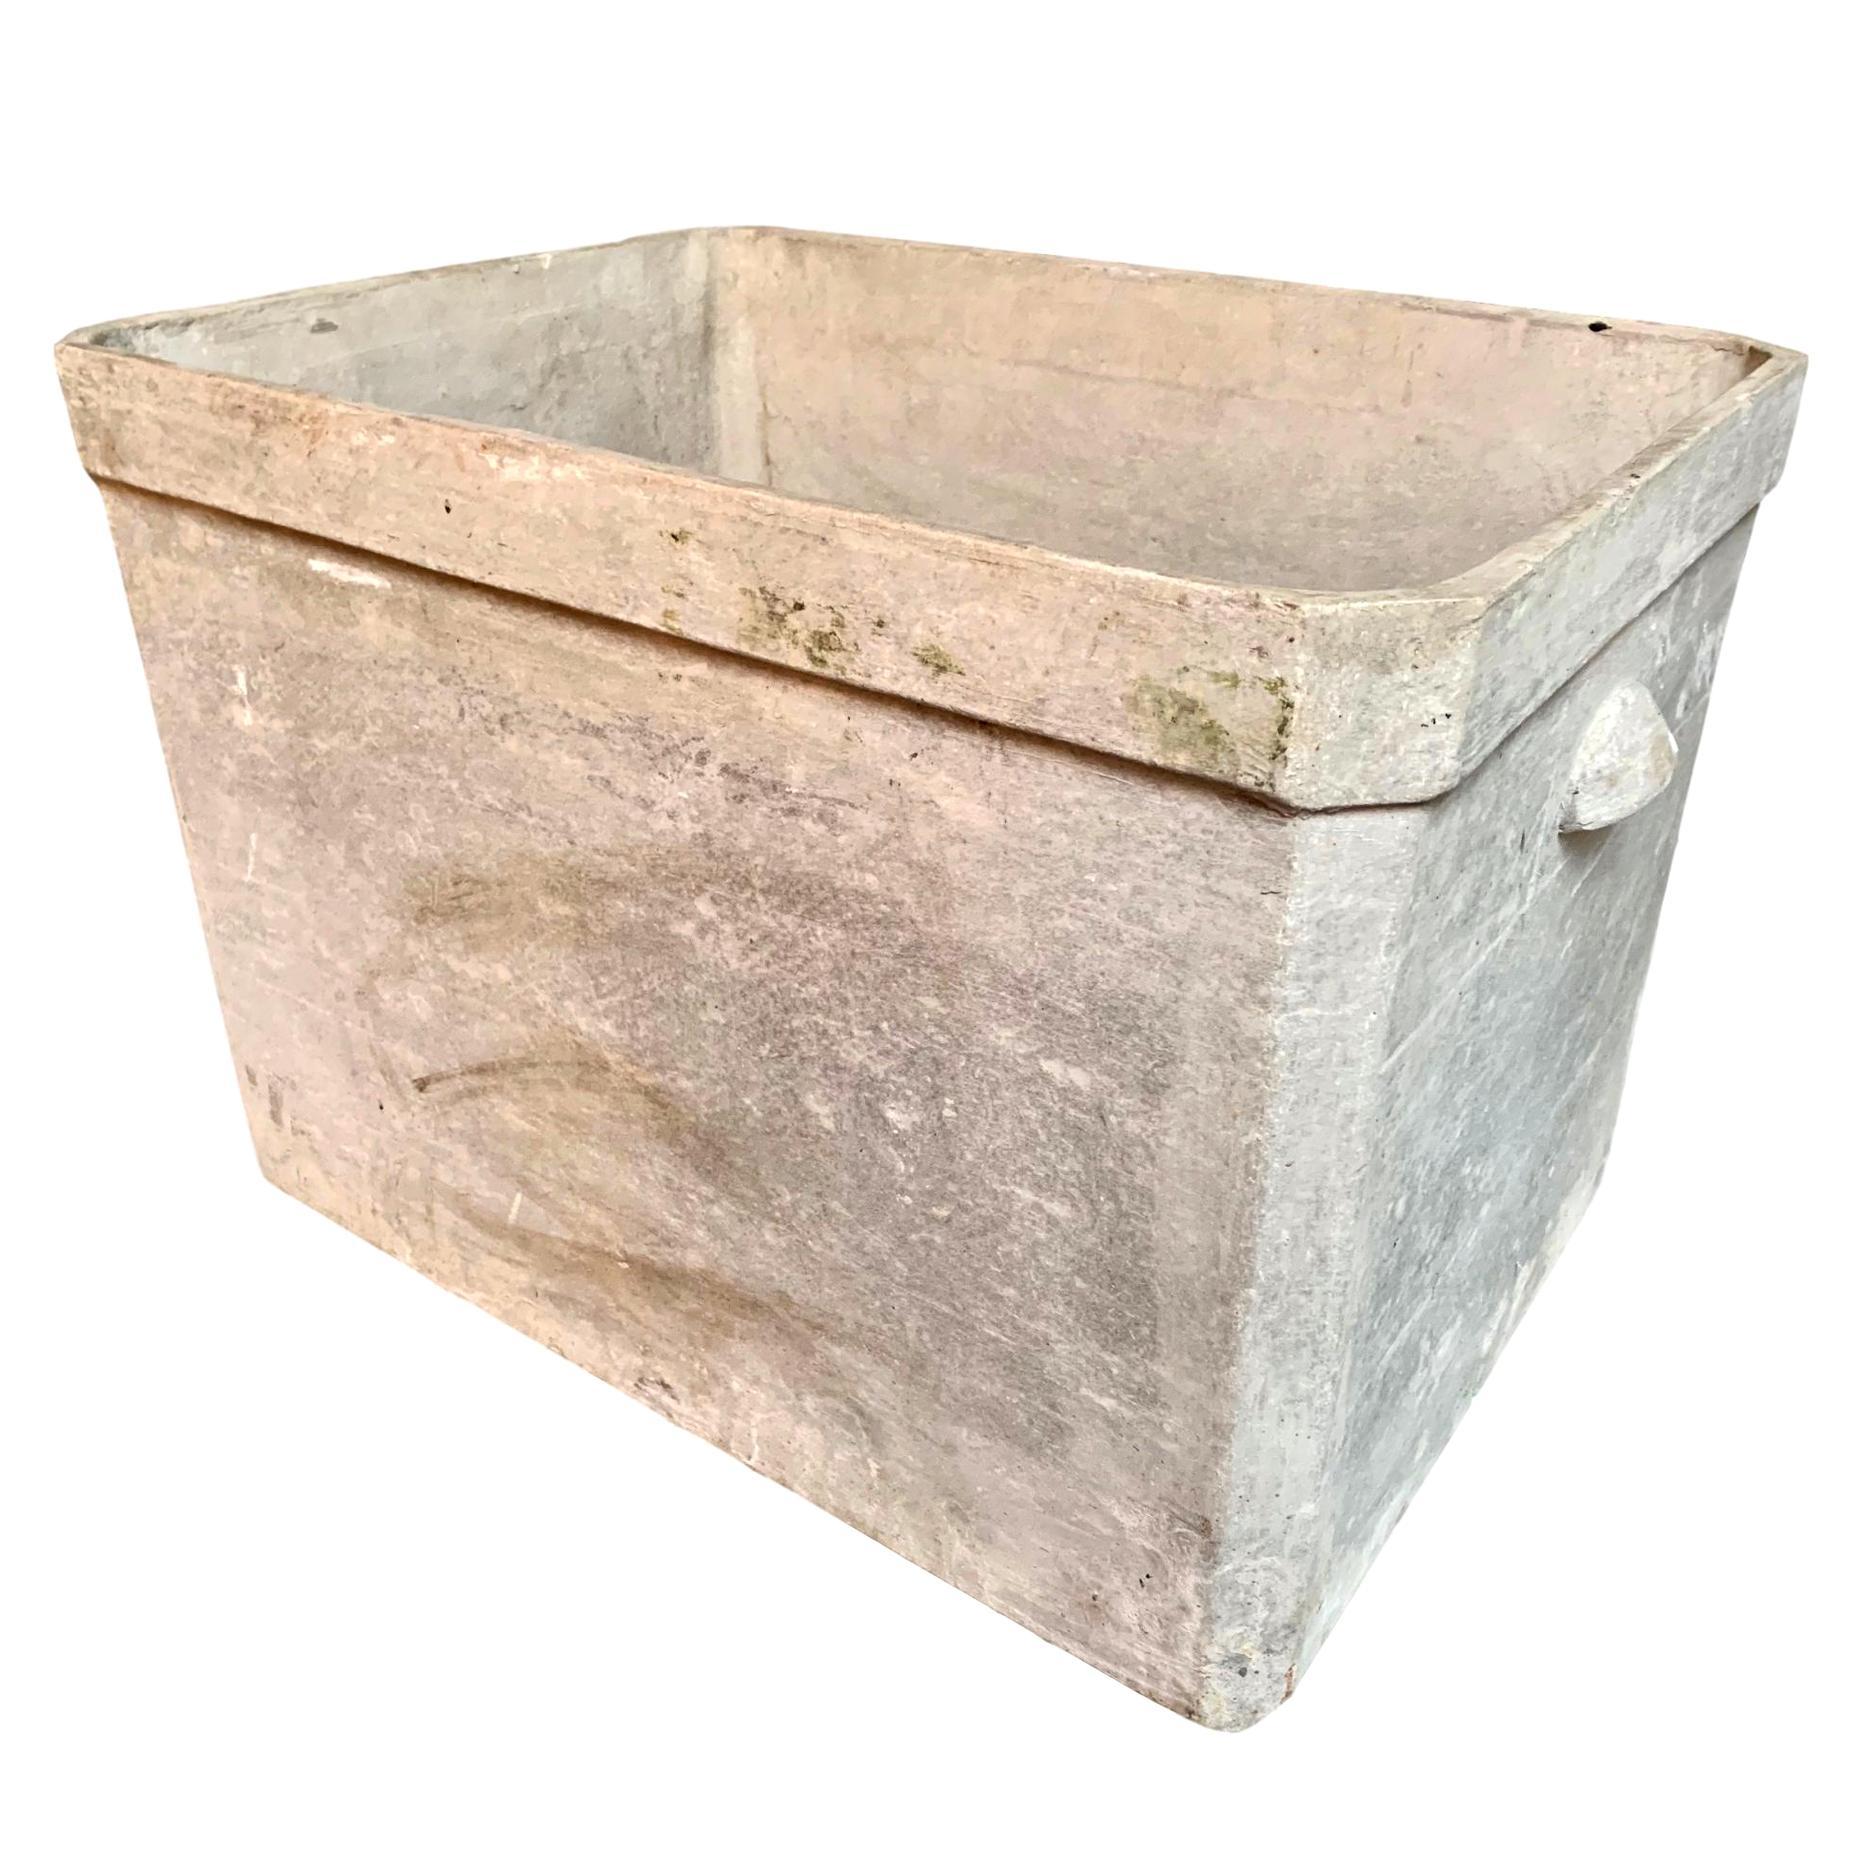 Large Willy Guhl Basin Concrete Planter